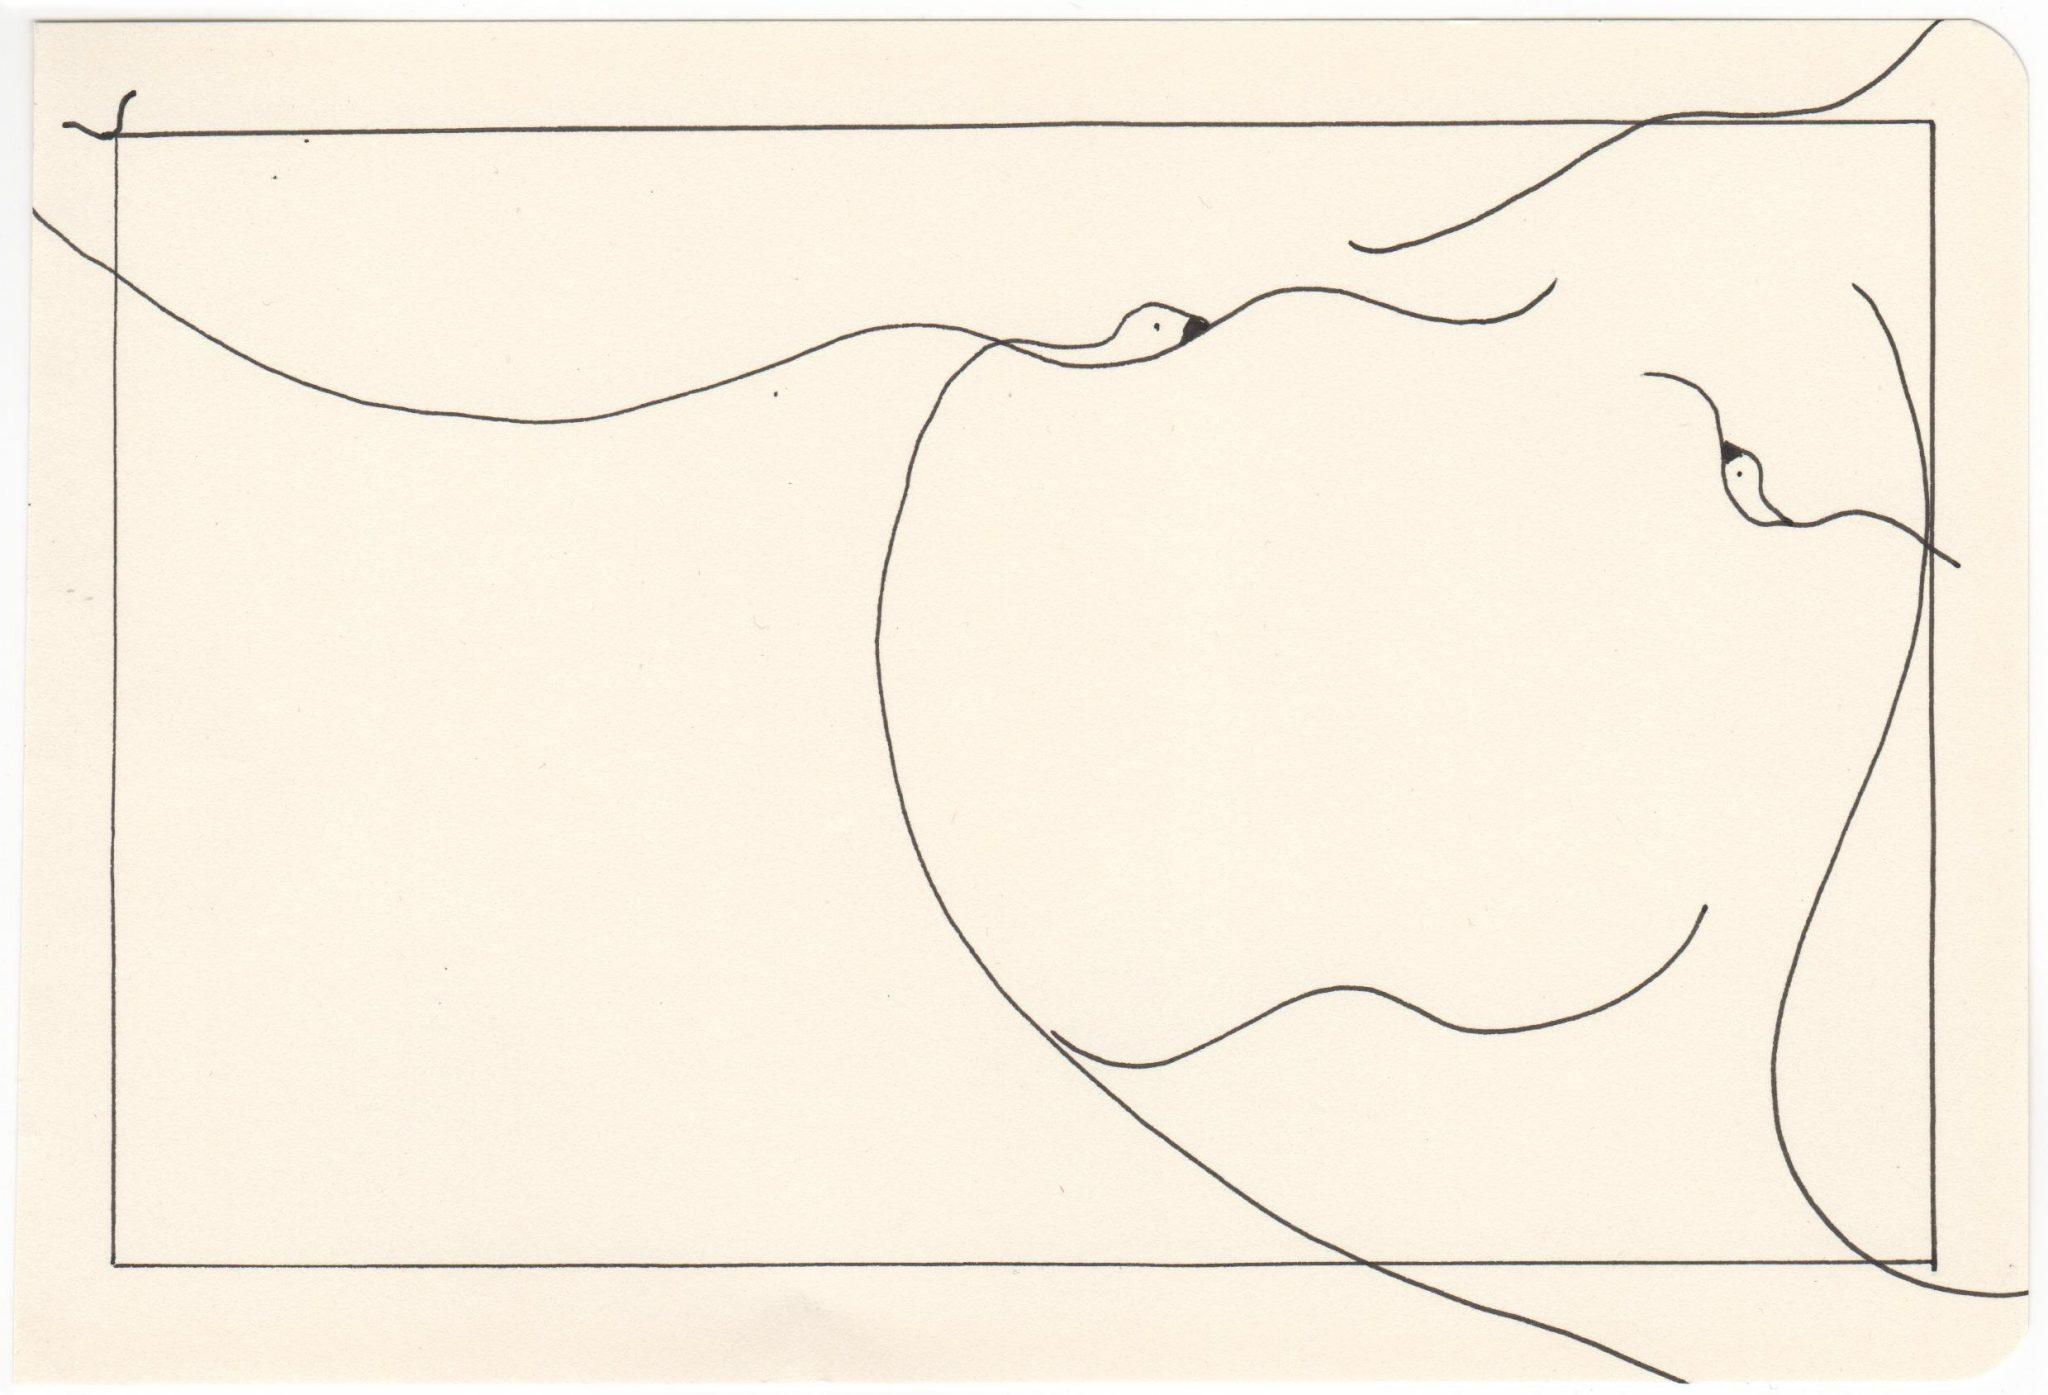 Kim Okura Flieg 4 Tusche Drawing